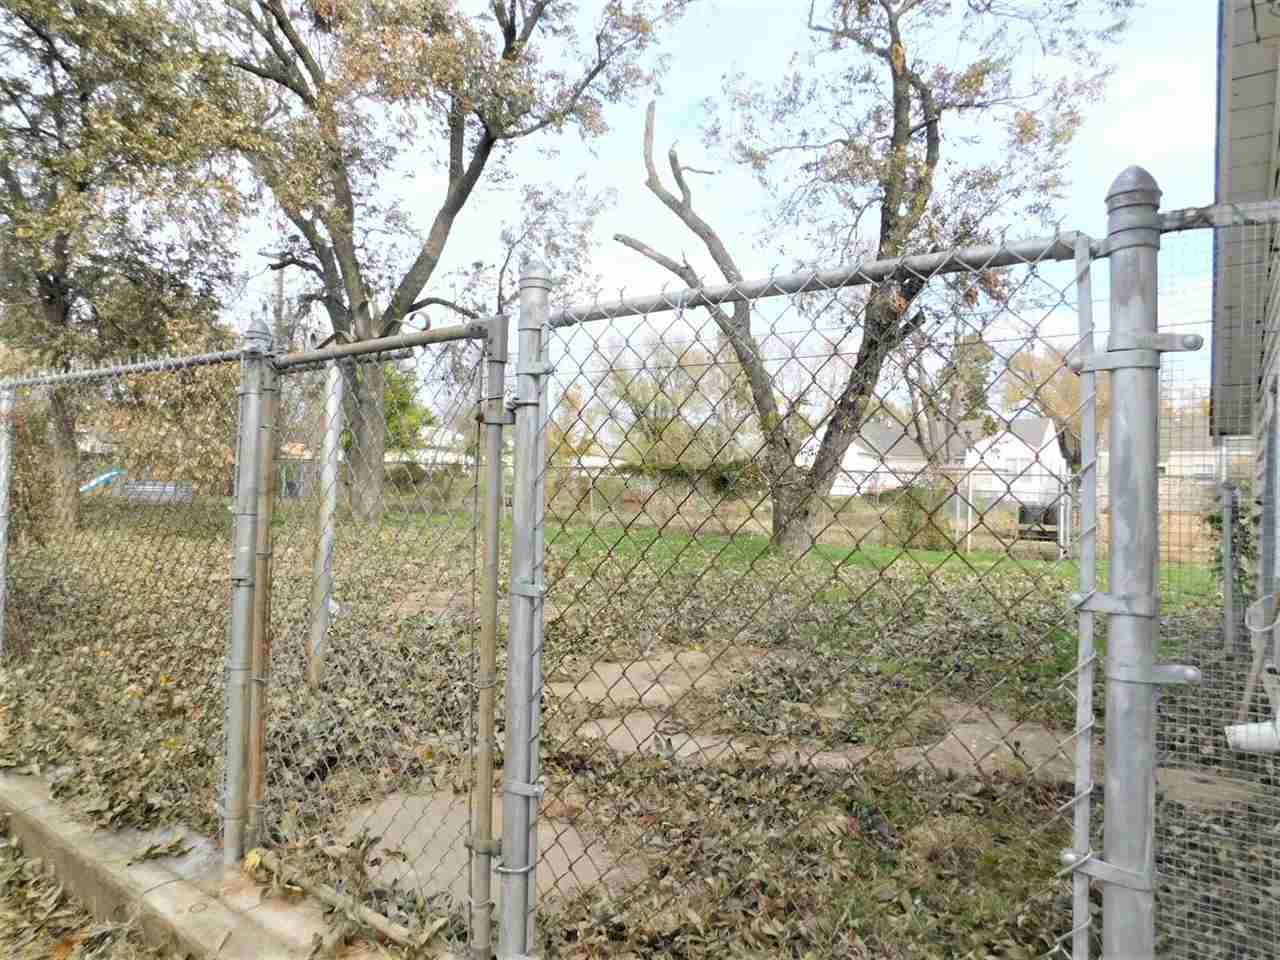 #century21groupone,#homesforsaleponcacity,#poncacityrealestate | 1515 S 7  Ponca City, OK 74601 14